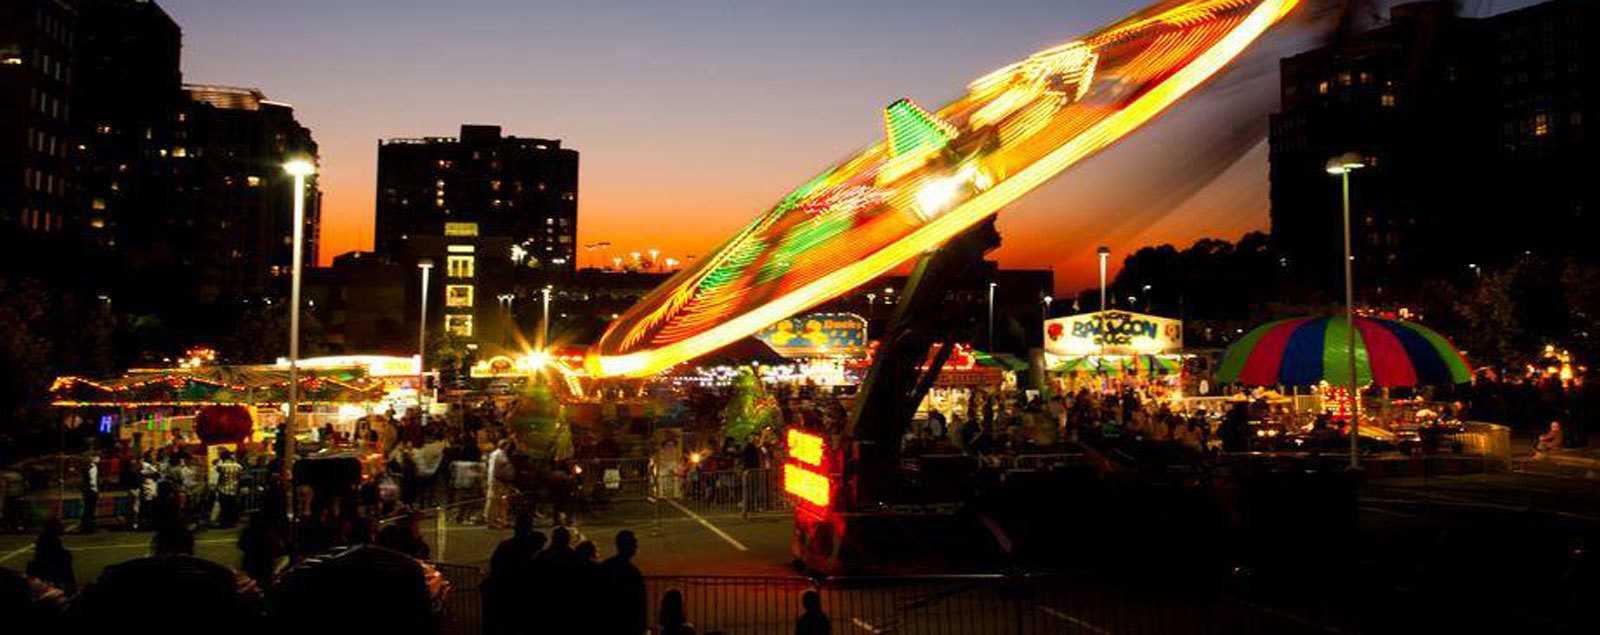 Festivals and fairs in virginia fairfax county va for Capital region craft fairs